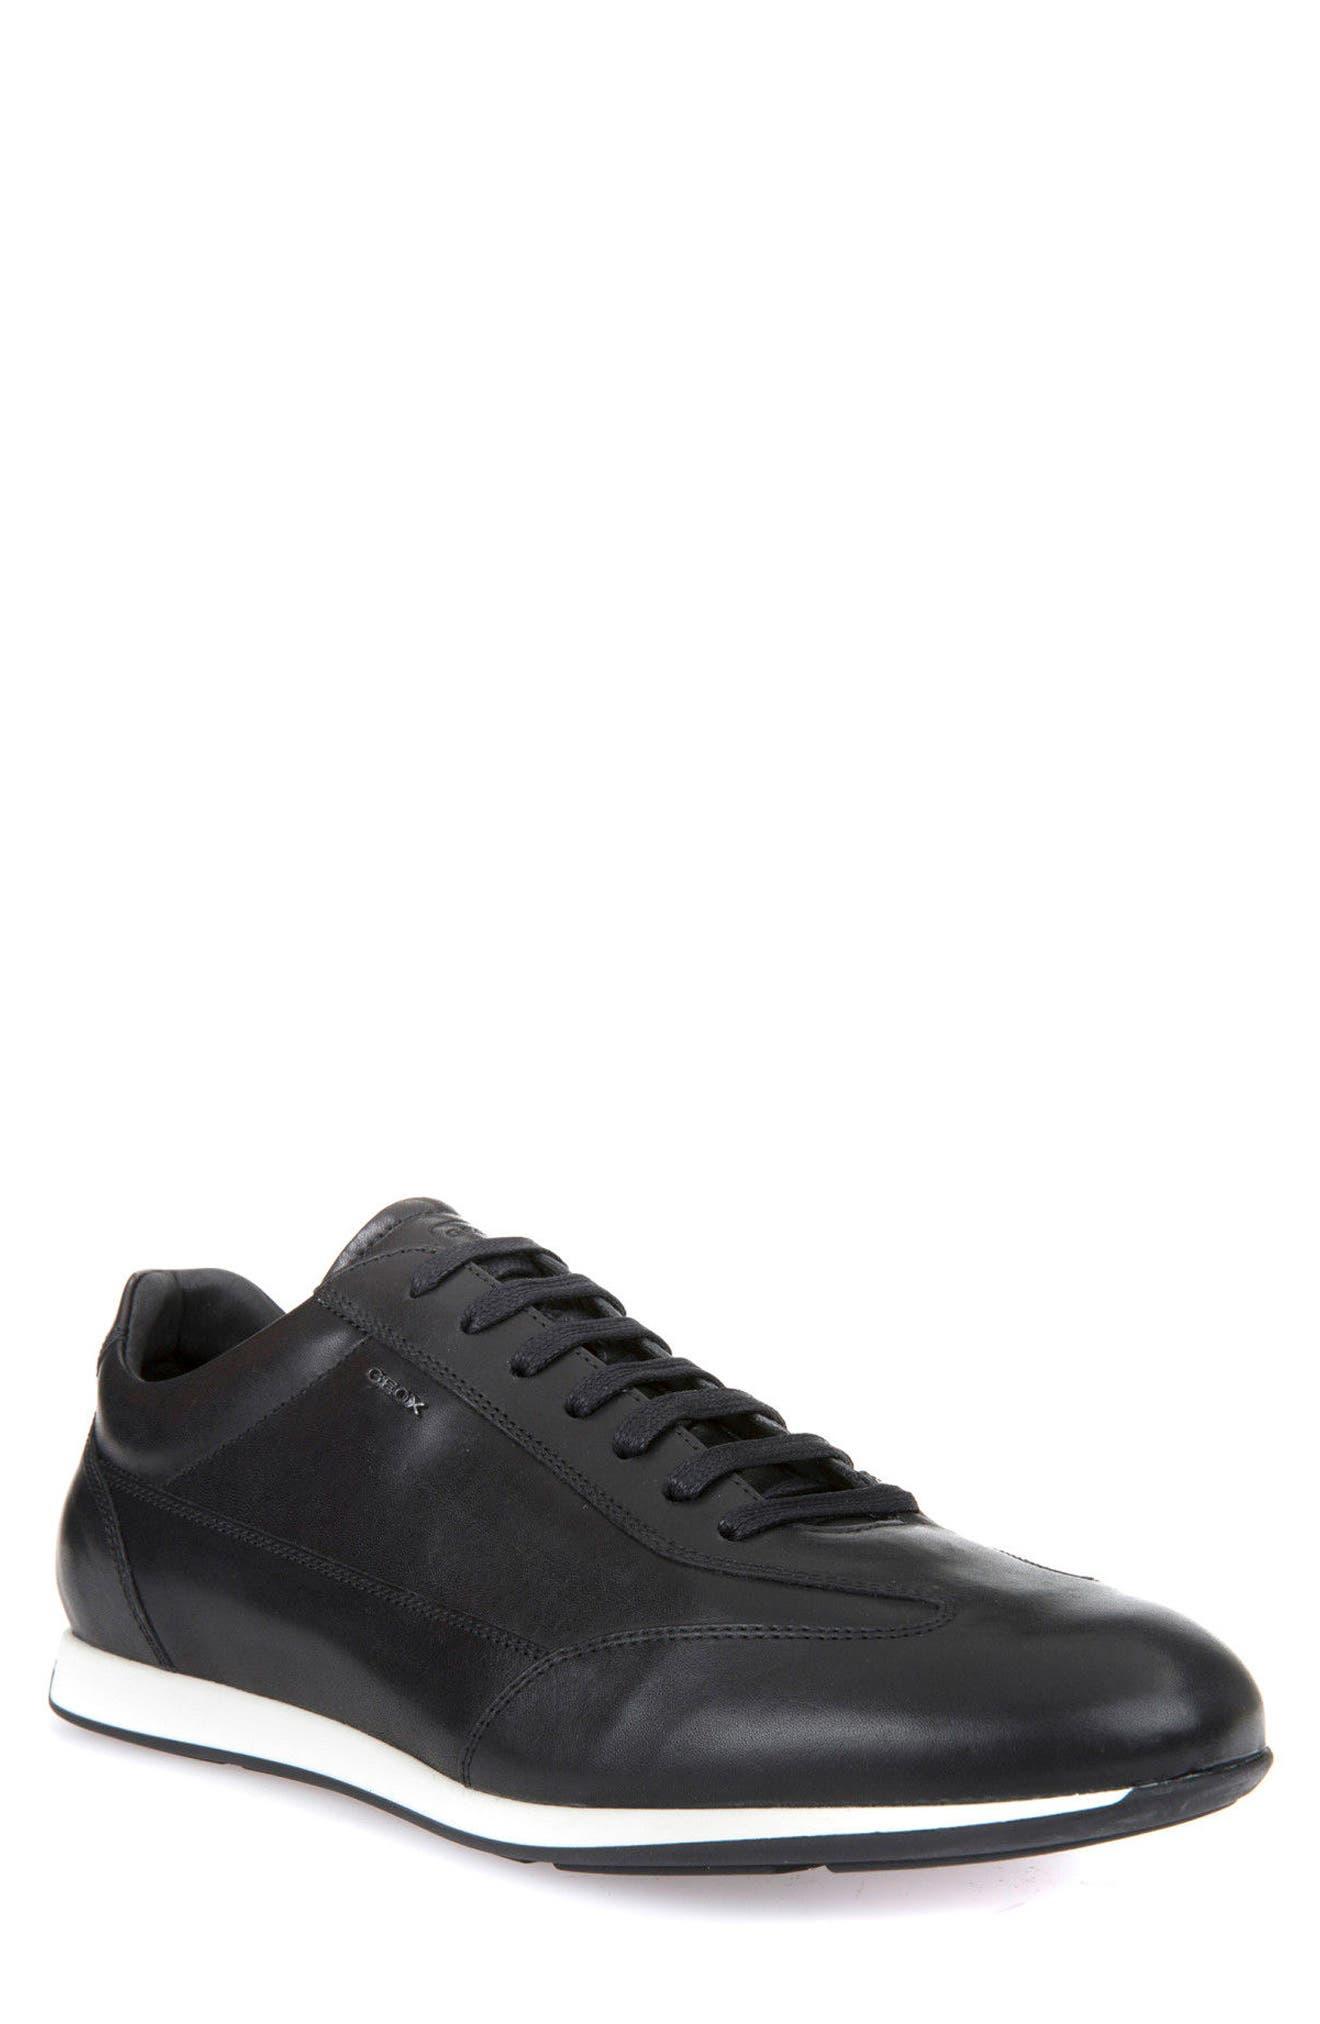 Clemet 1 Sneaker,                         Main,                         color, 001